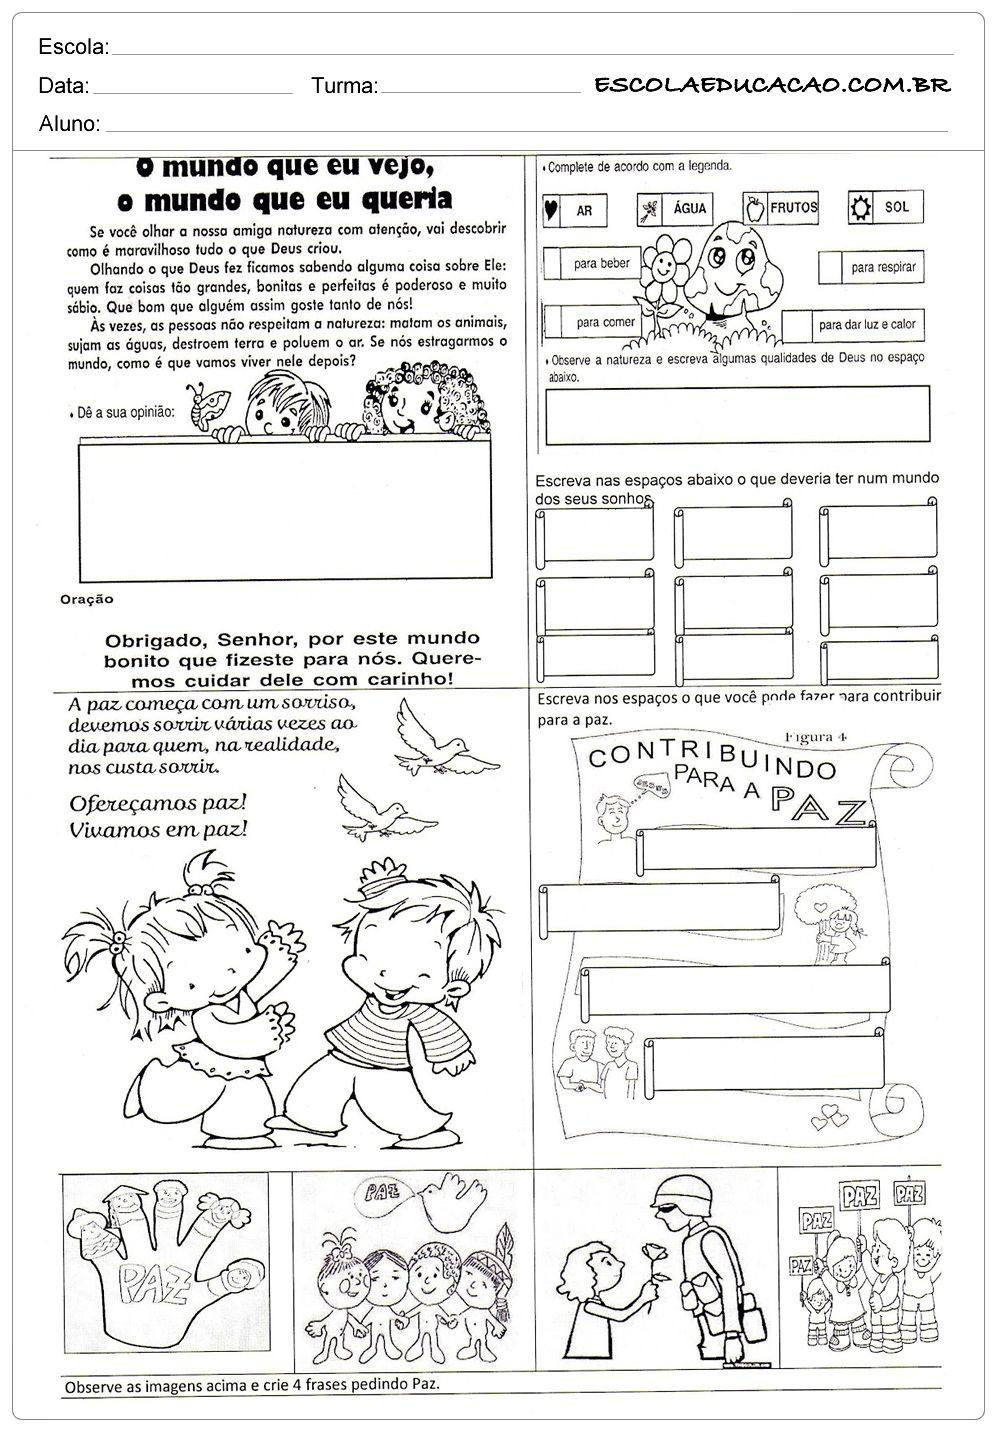 Atividades De Ensino Para Imprimir 2 Ensino Religioso